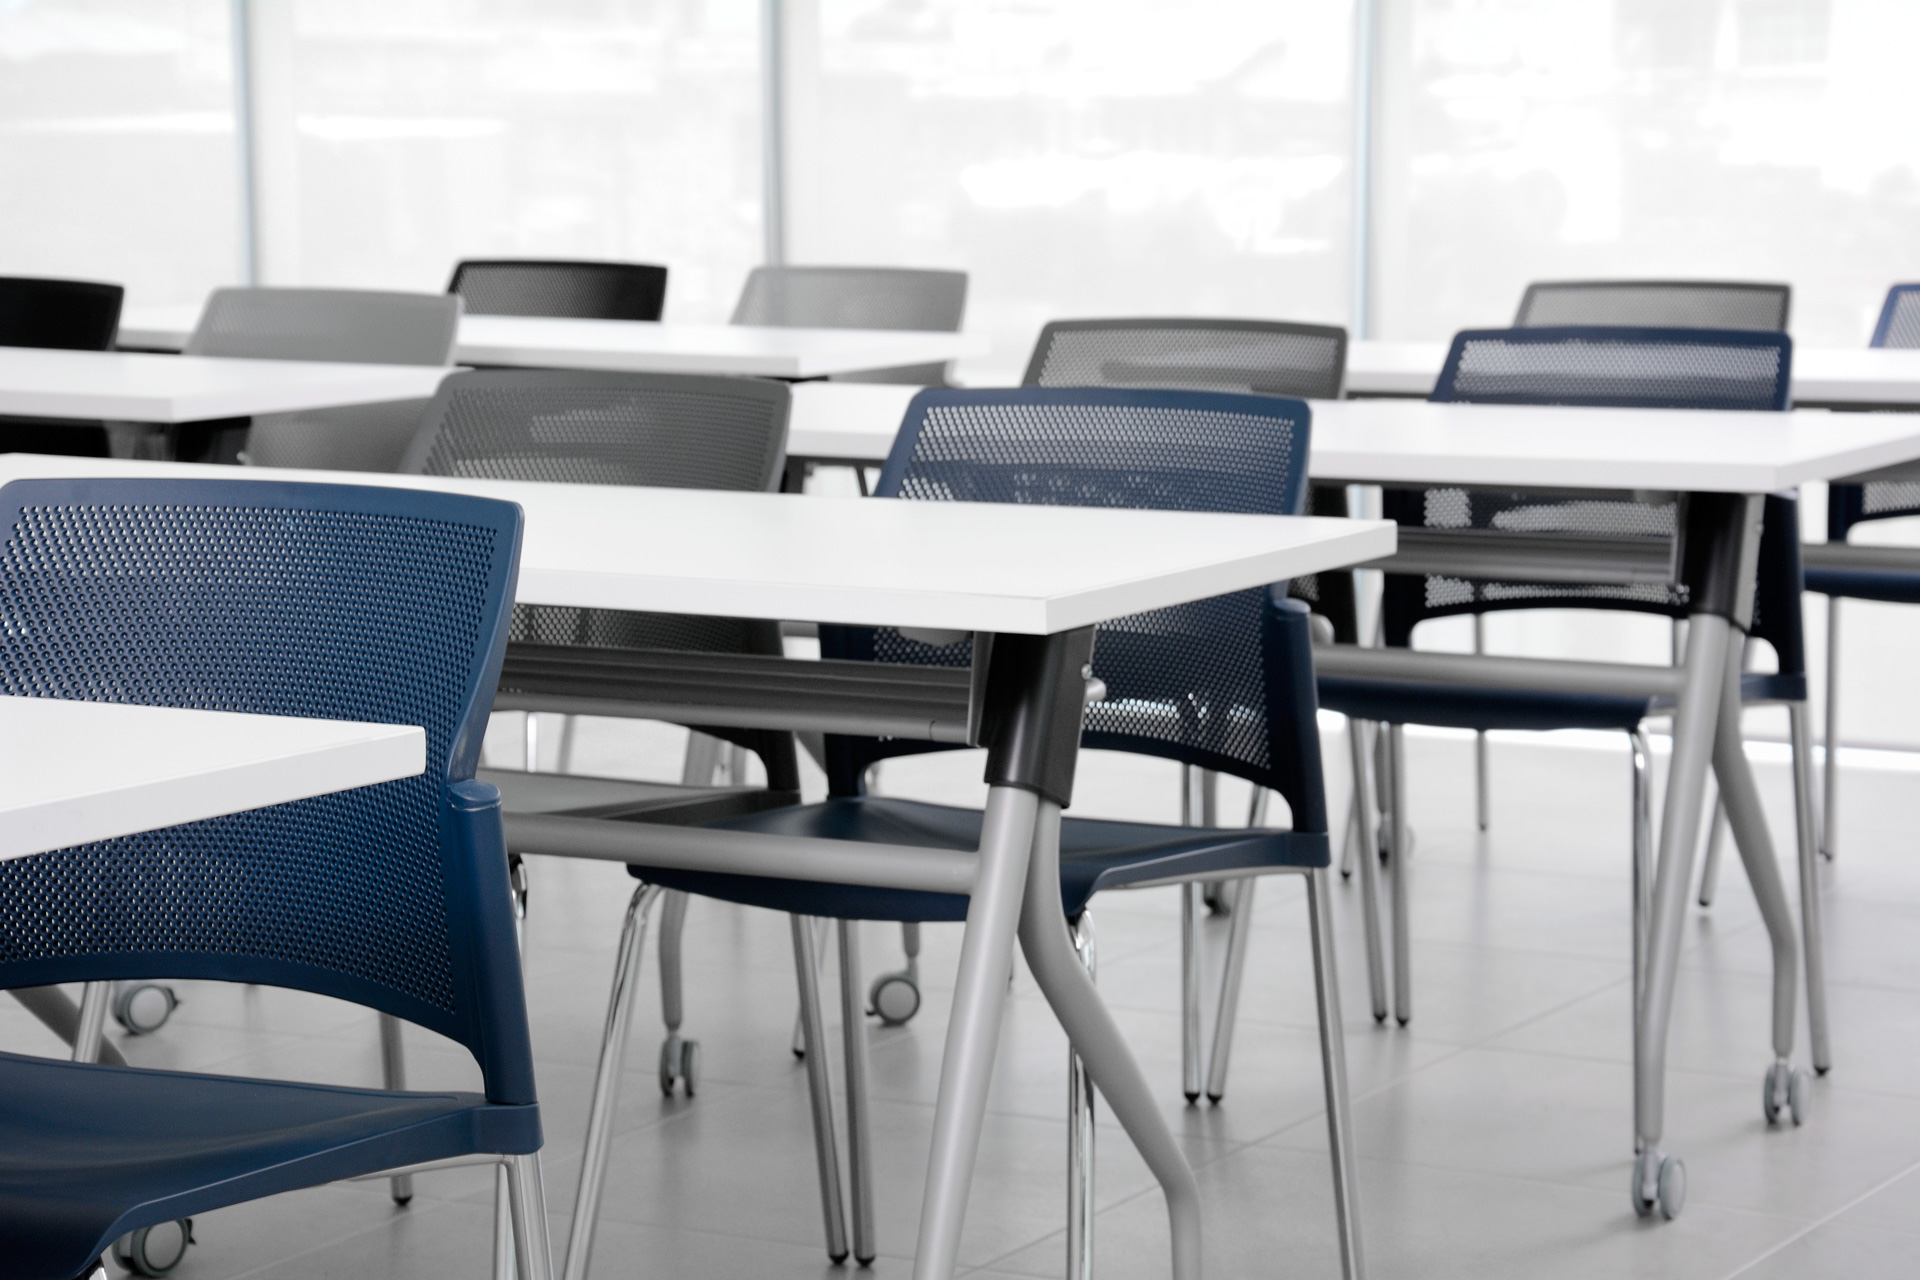 Muebles para oficina queretaro 02 muebles para oficina for Muebles de oficina concepto